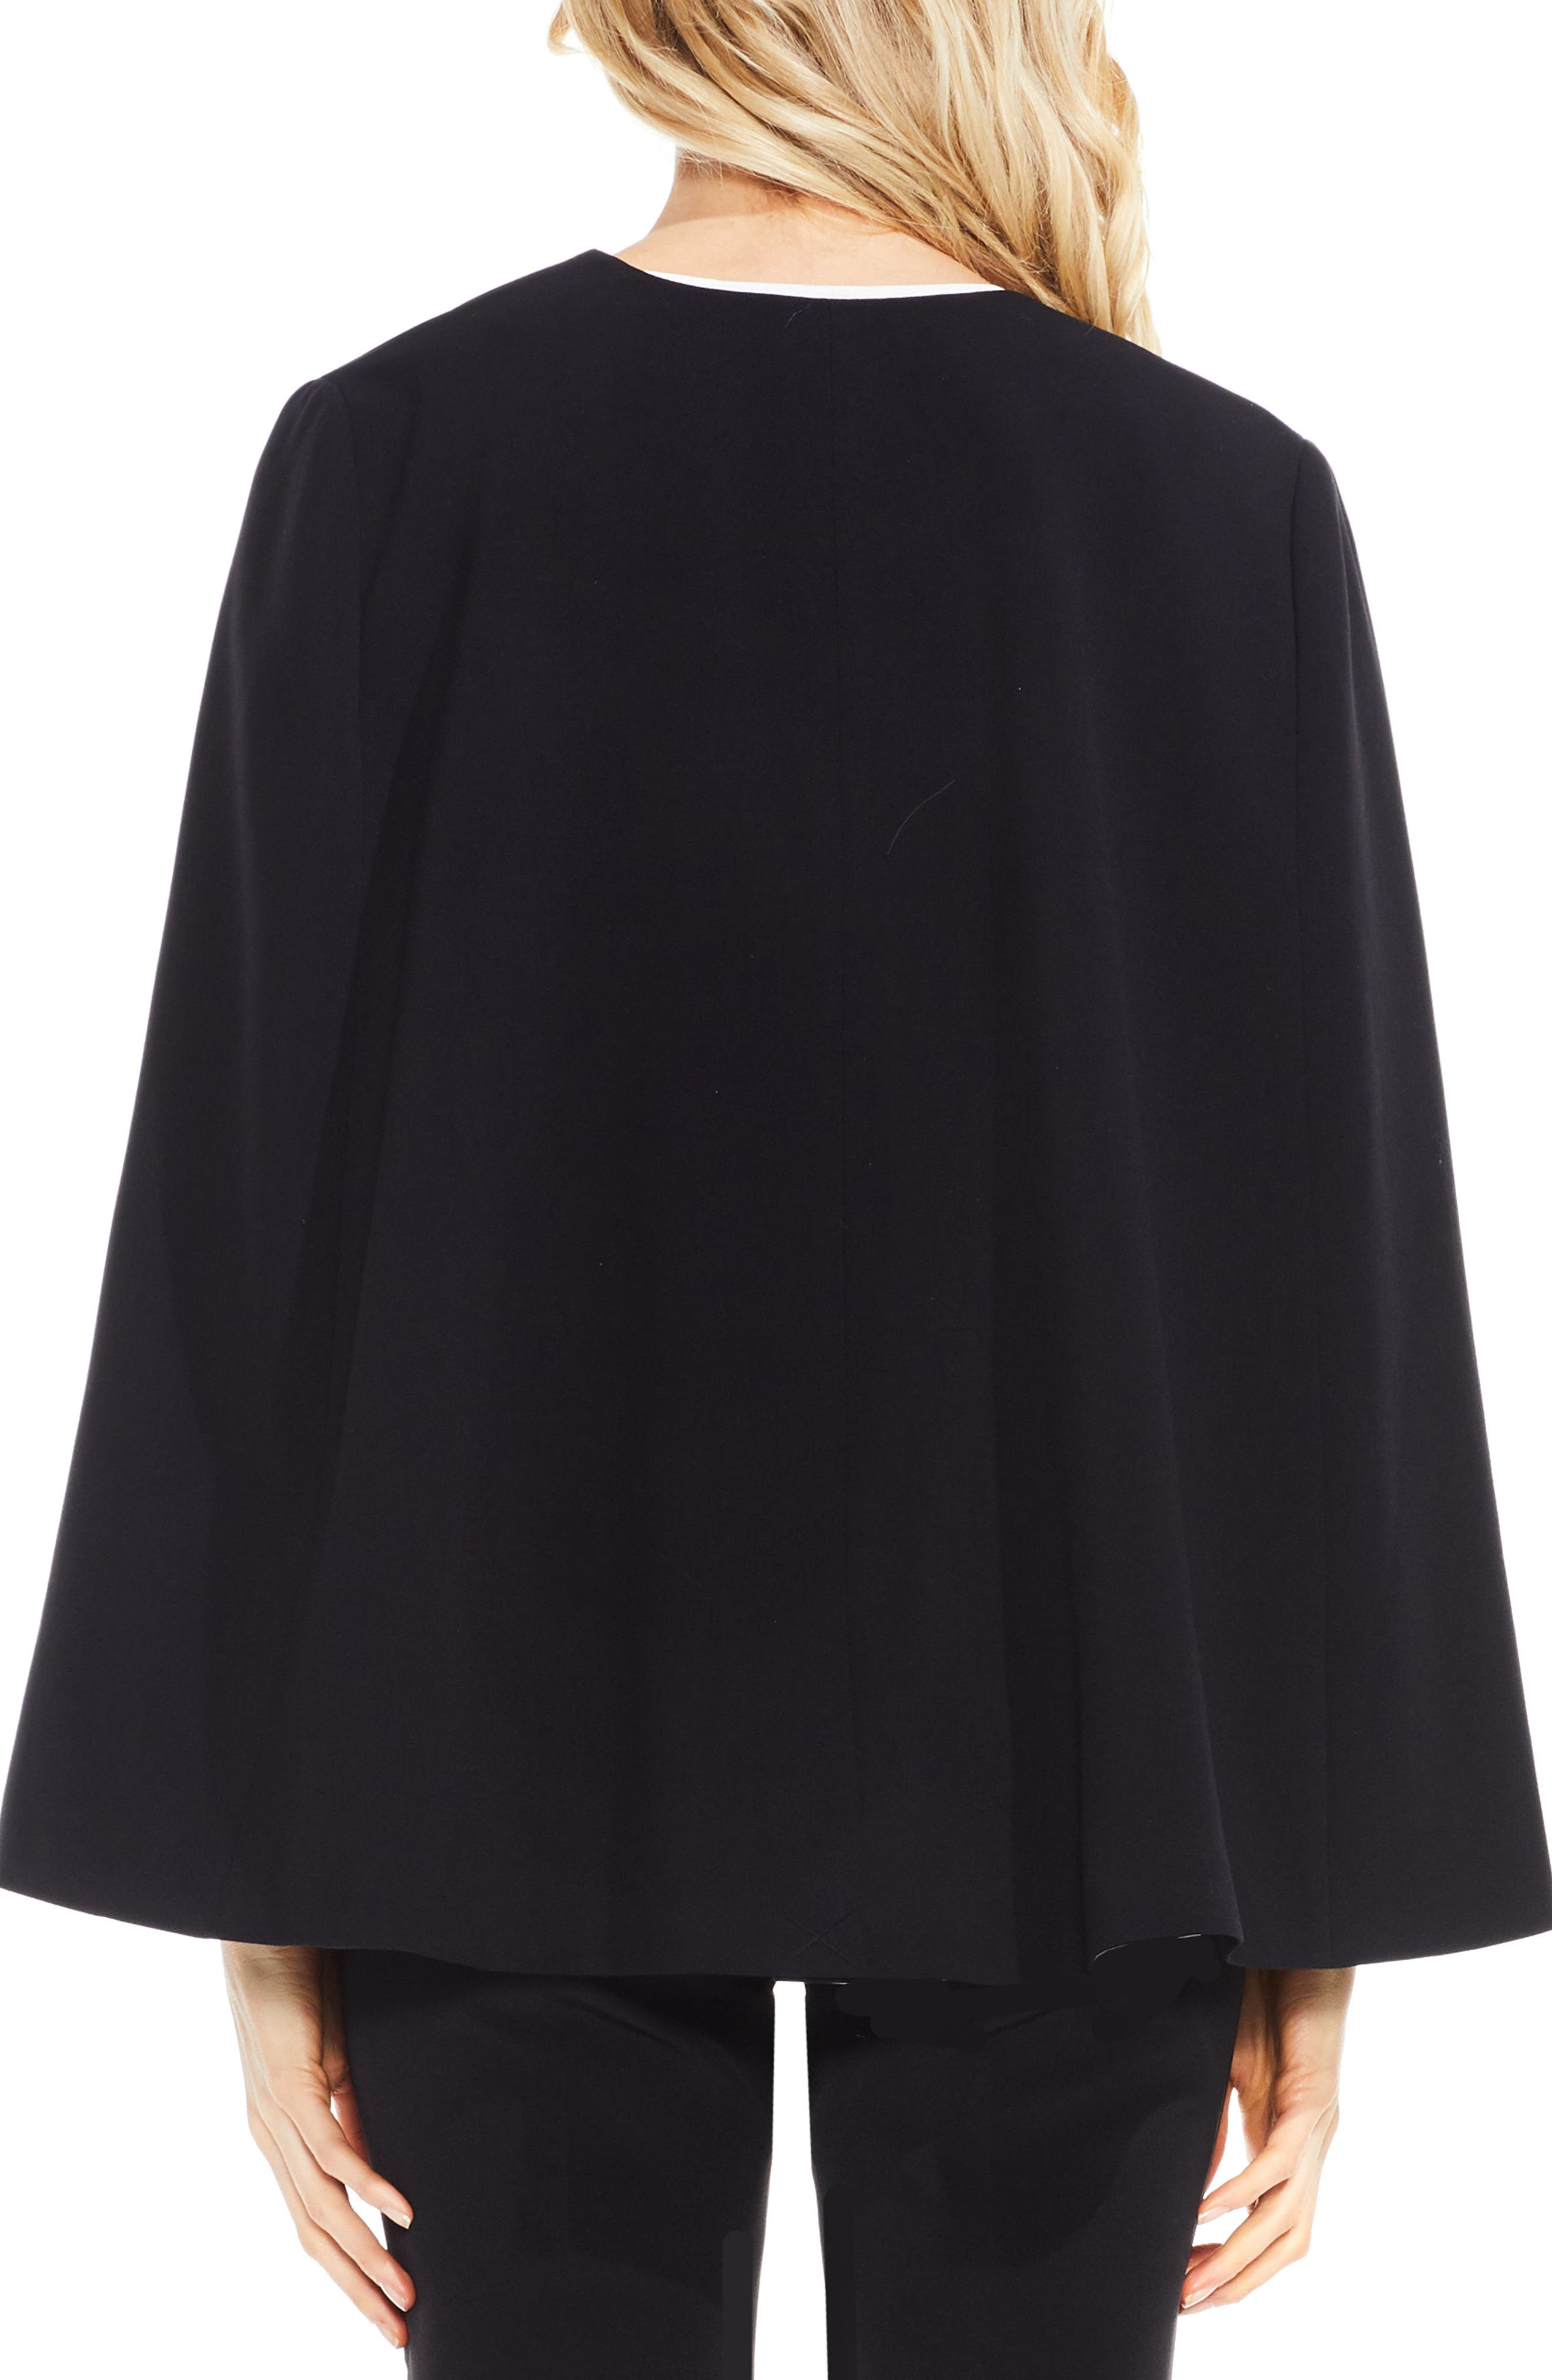 Milano Twill Cape Jacket,                             Alternate thumbnail 2, color,                             RICH BLACK